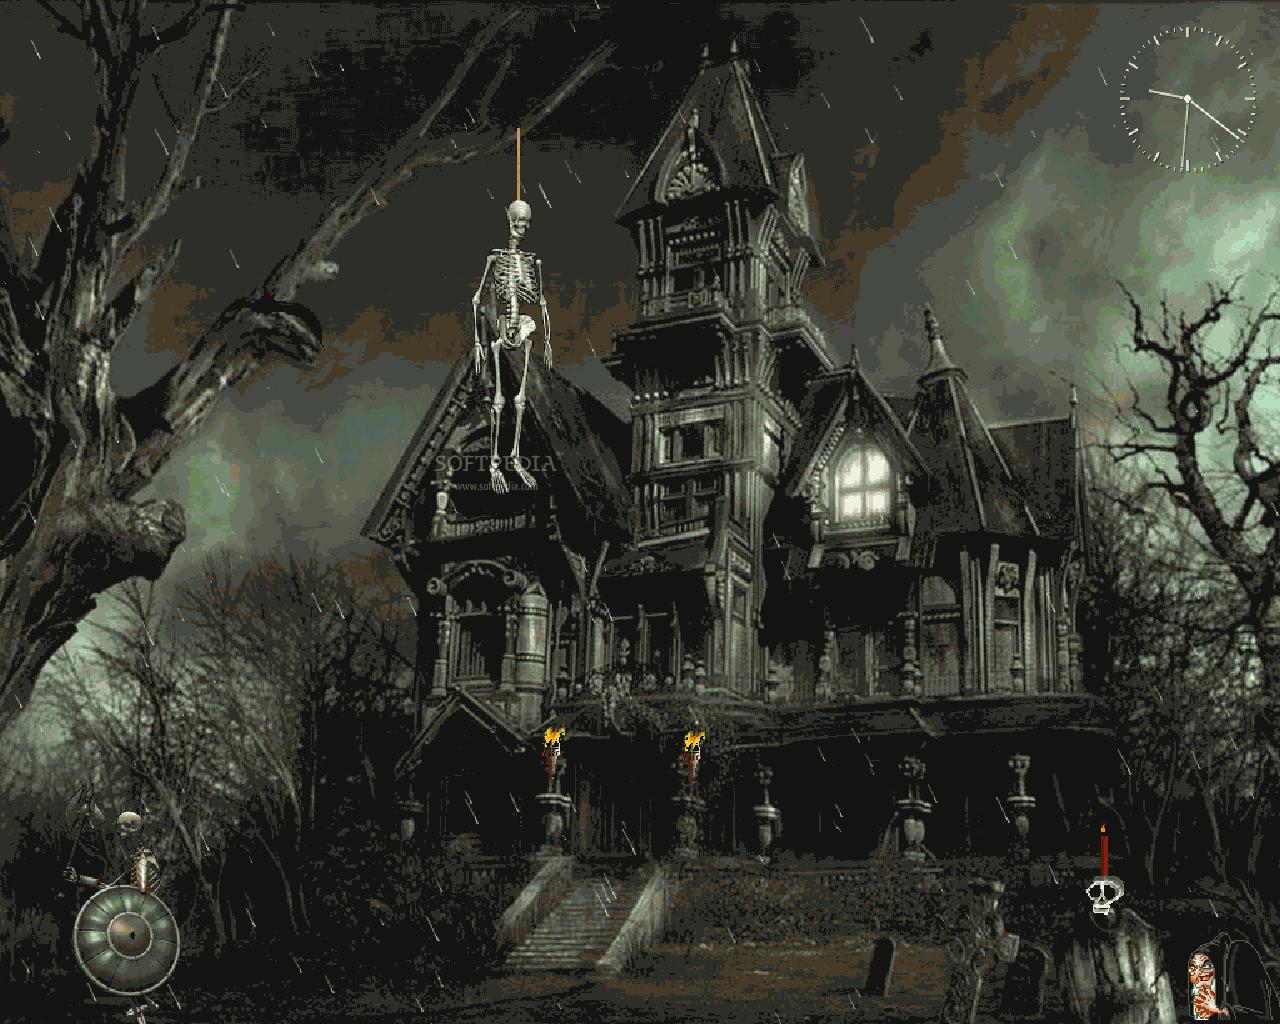 The Best Wallpaper Horror Movies Wallpaper 1280x1024